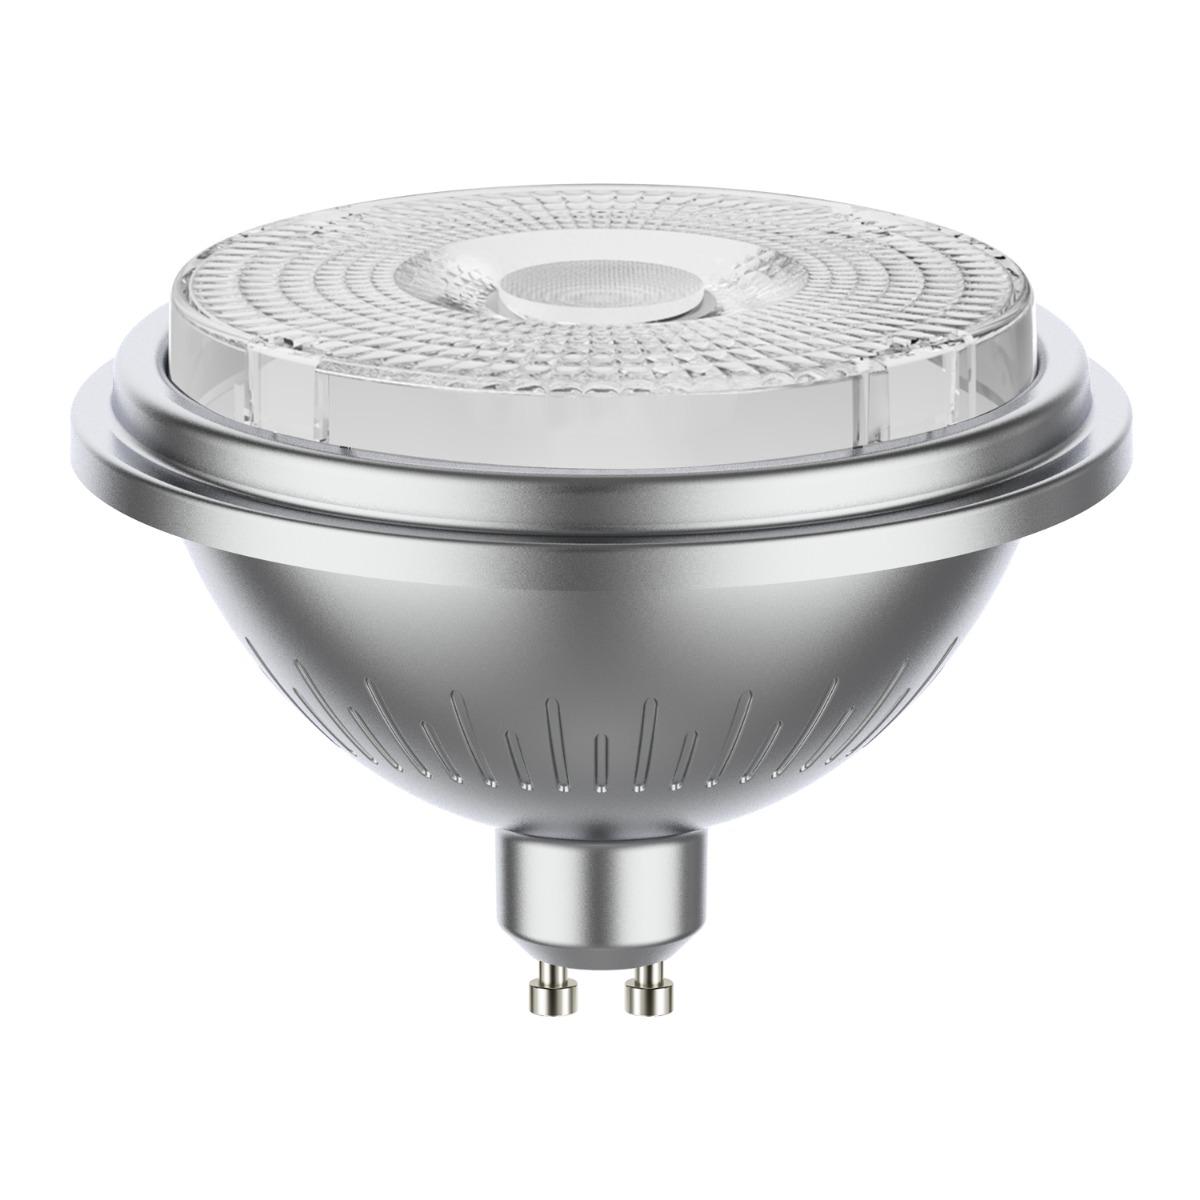 Noxion LEDspot AR111 GU10 7.5W 927 40D 530lm | Dimbaar - Zeer Warm Wit - Vervangt 50W